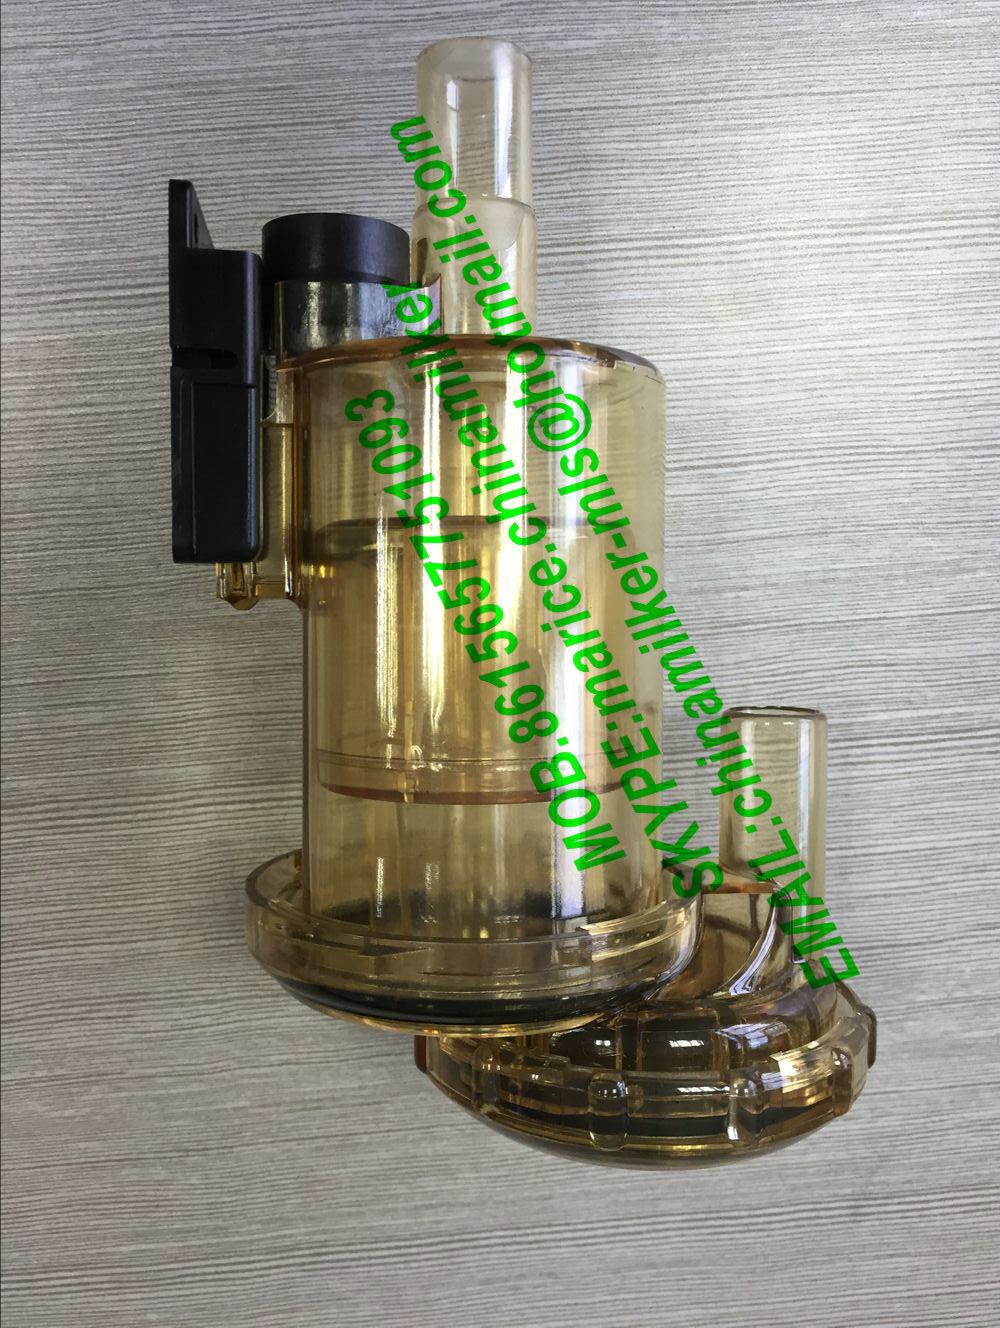 DUOVAC مؤشر تدفق F12, معدات الحلب ملحقات صالون الحلب